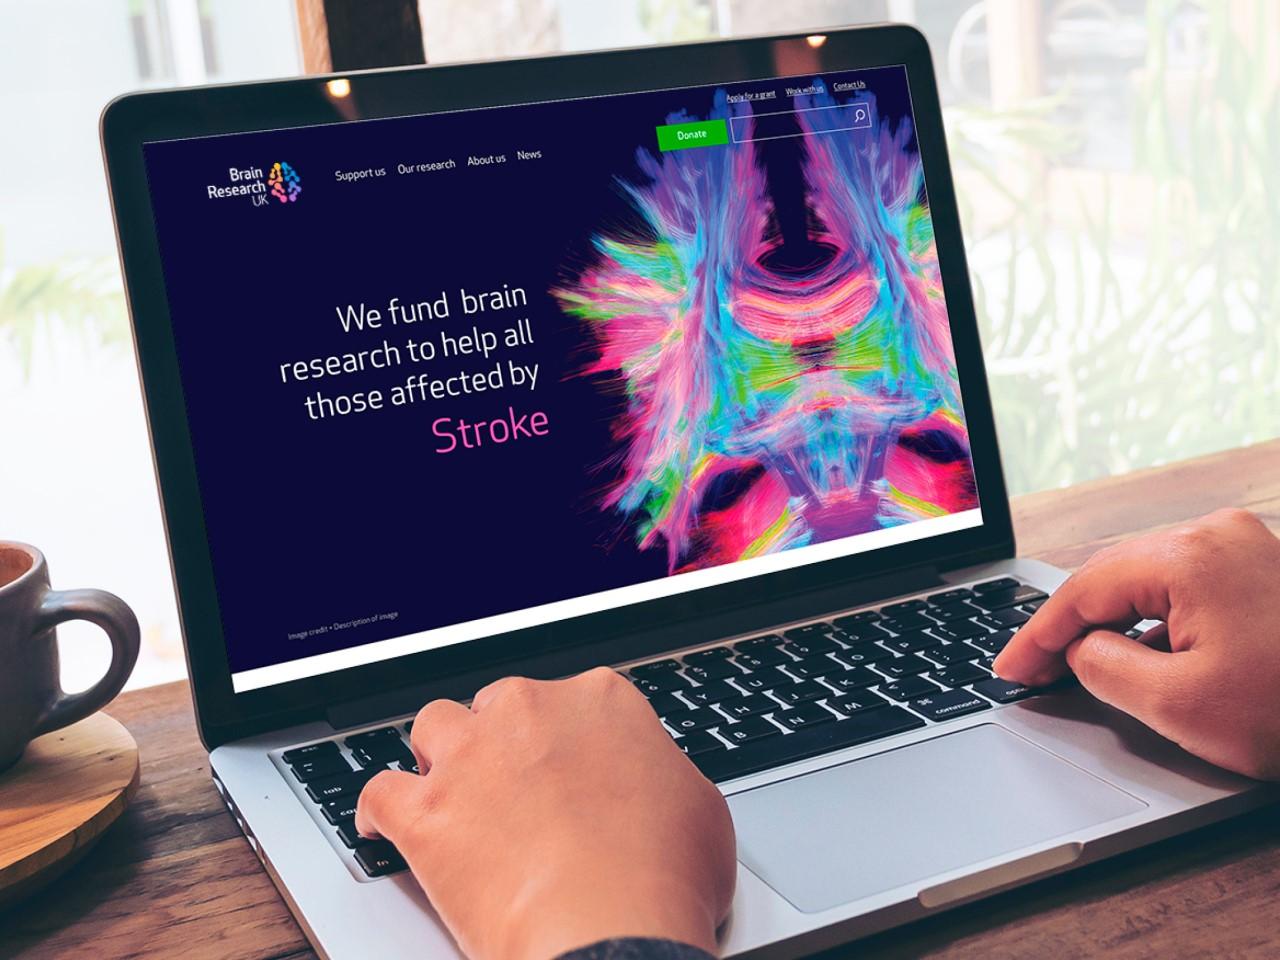 Brain Research UK website